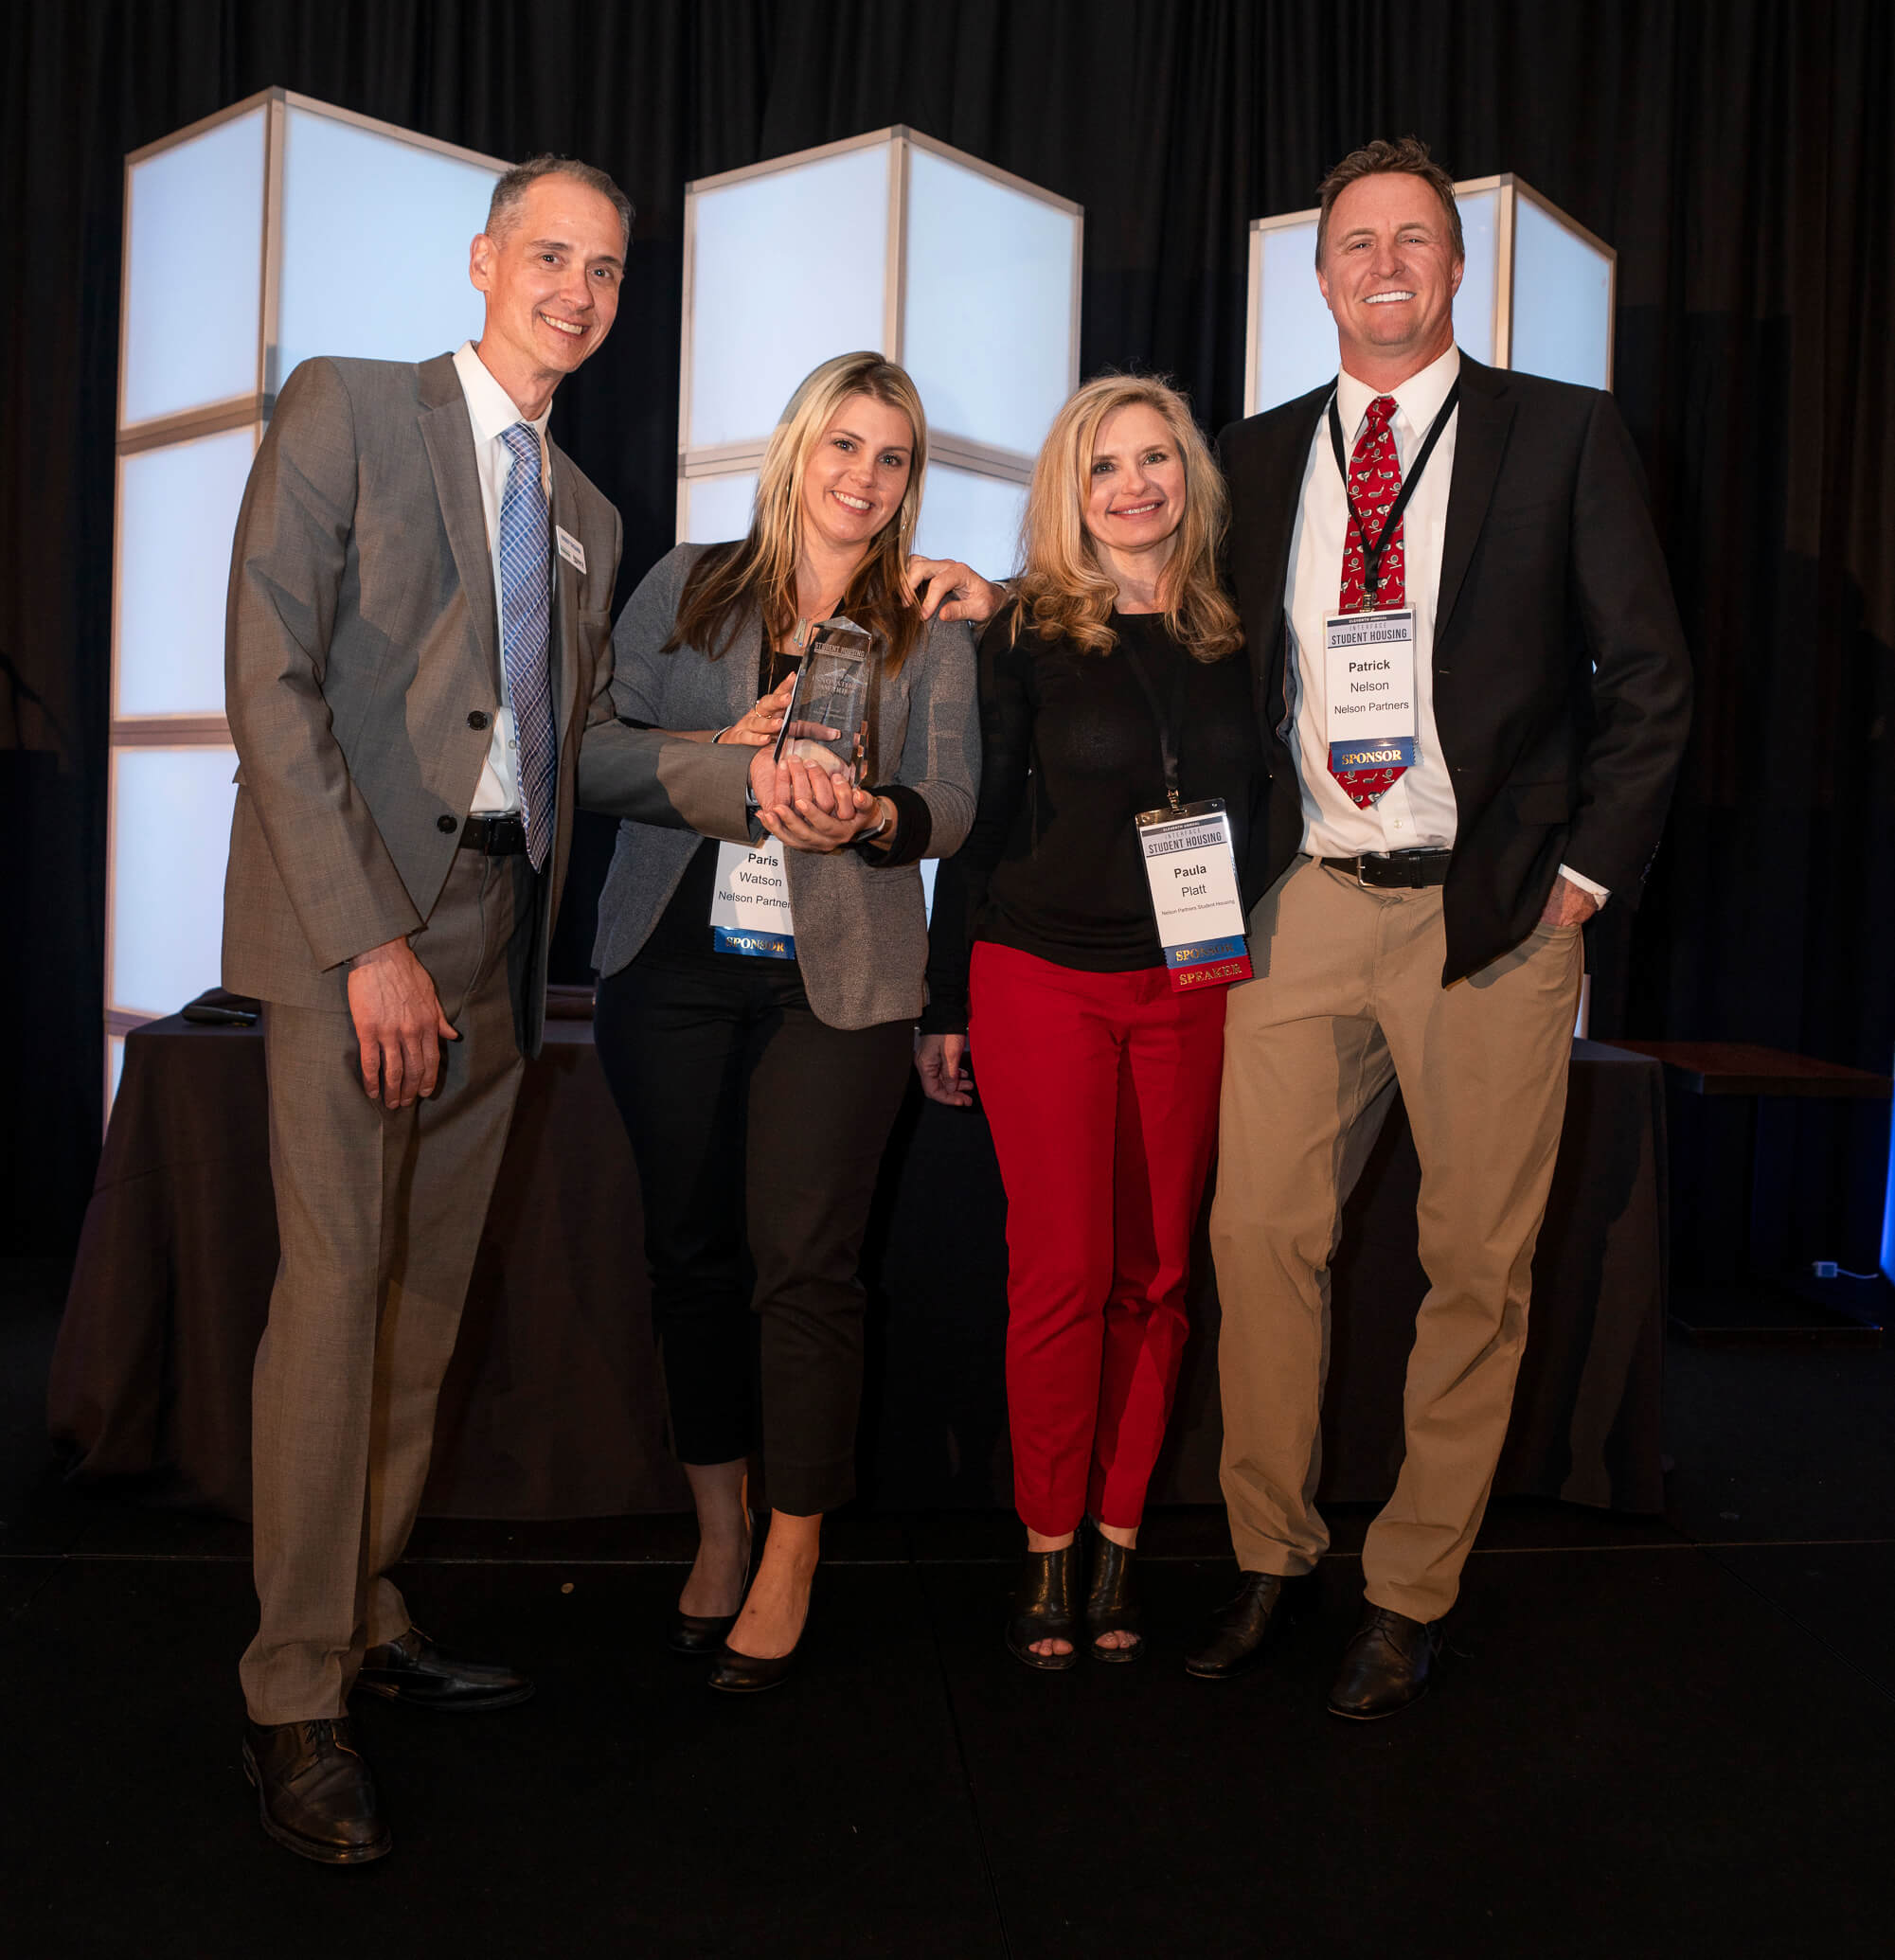 Nelson-Partners-Student-Housing-Business-Award-02